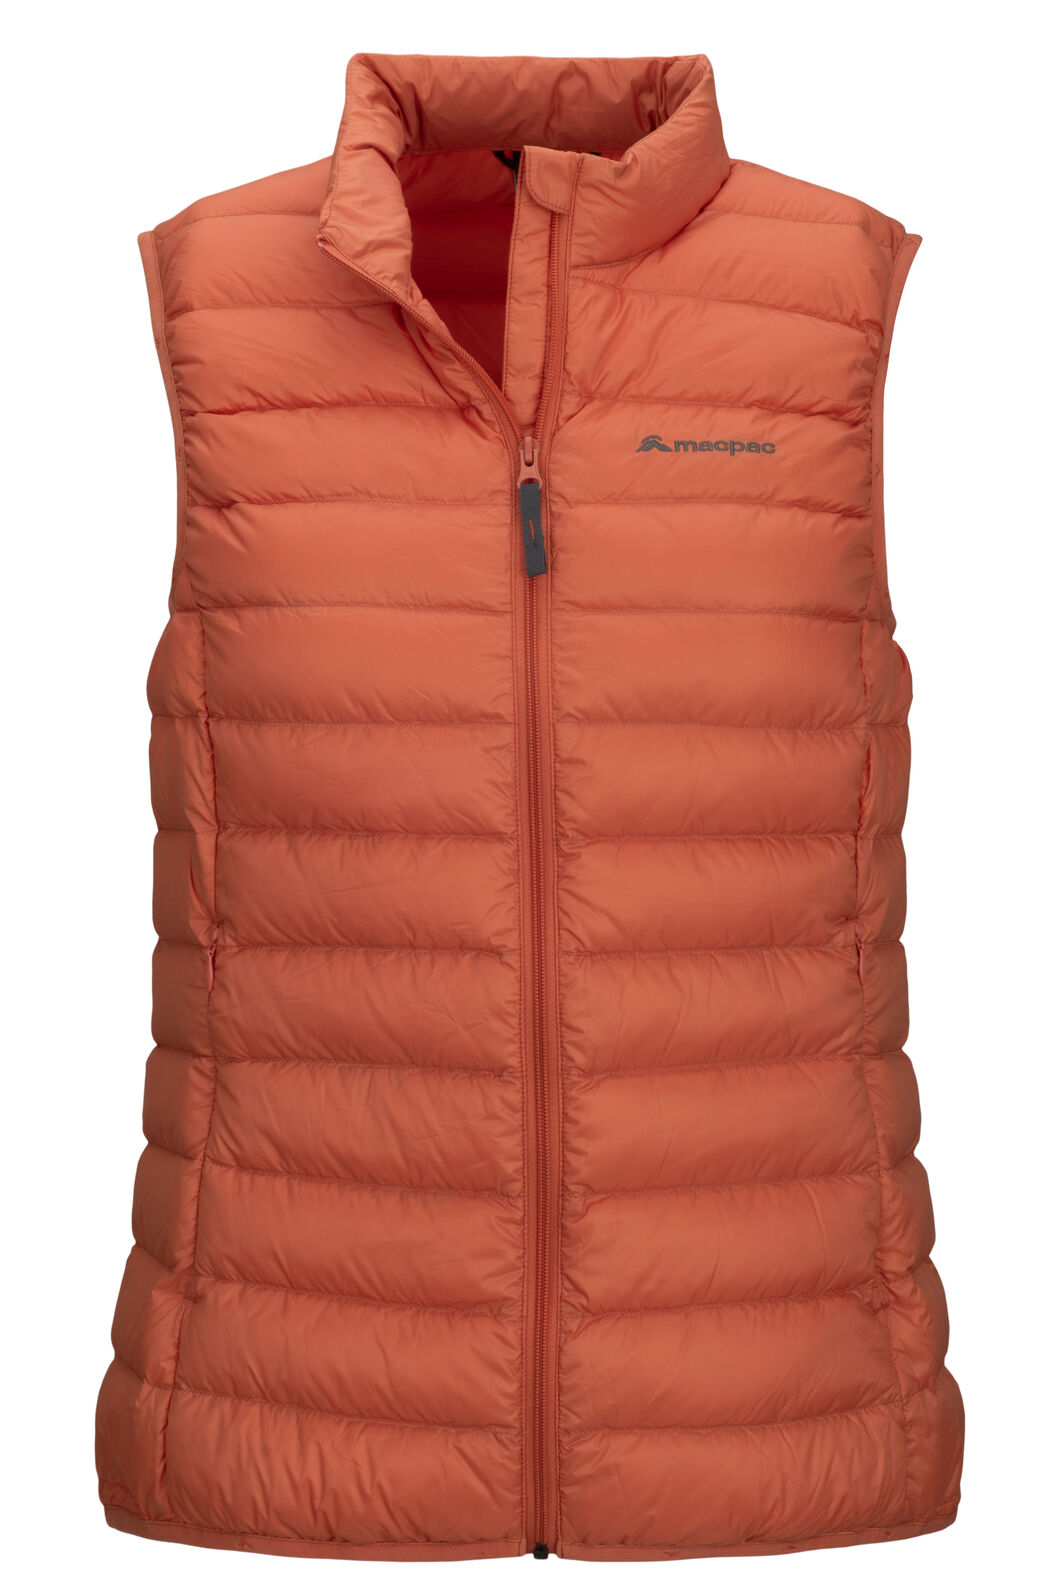 Macpac Women's Uber Light Down Vest, Apricot Brandy, hi-res